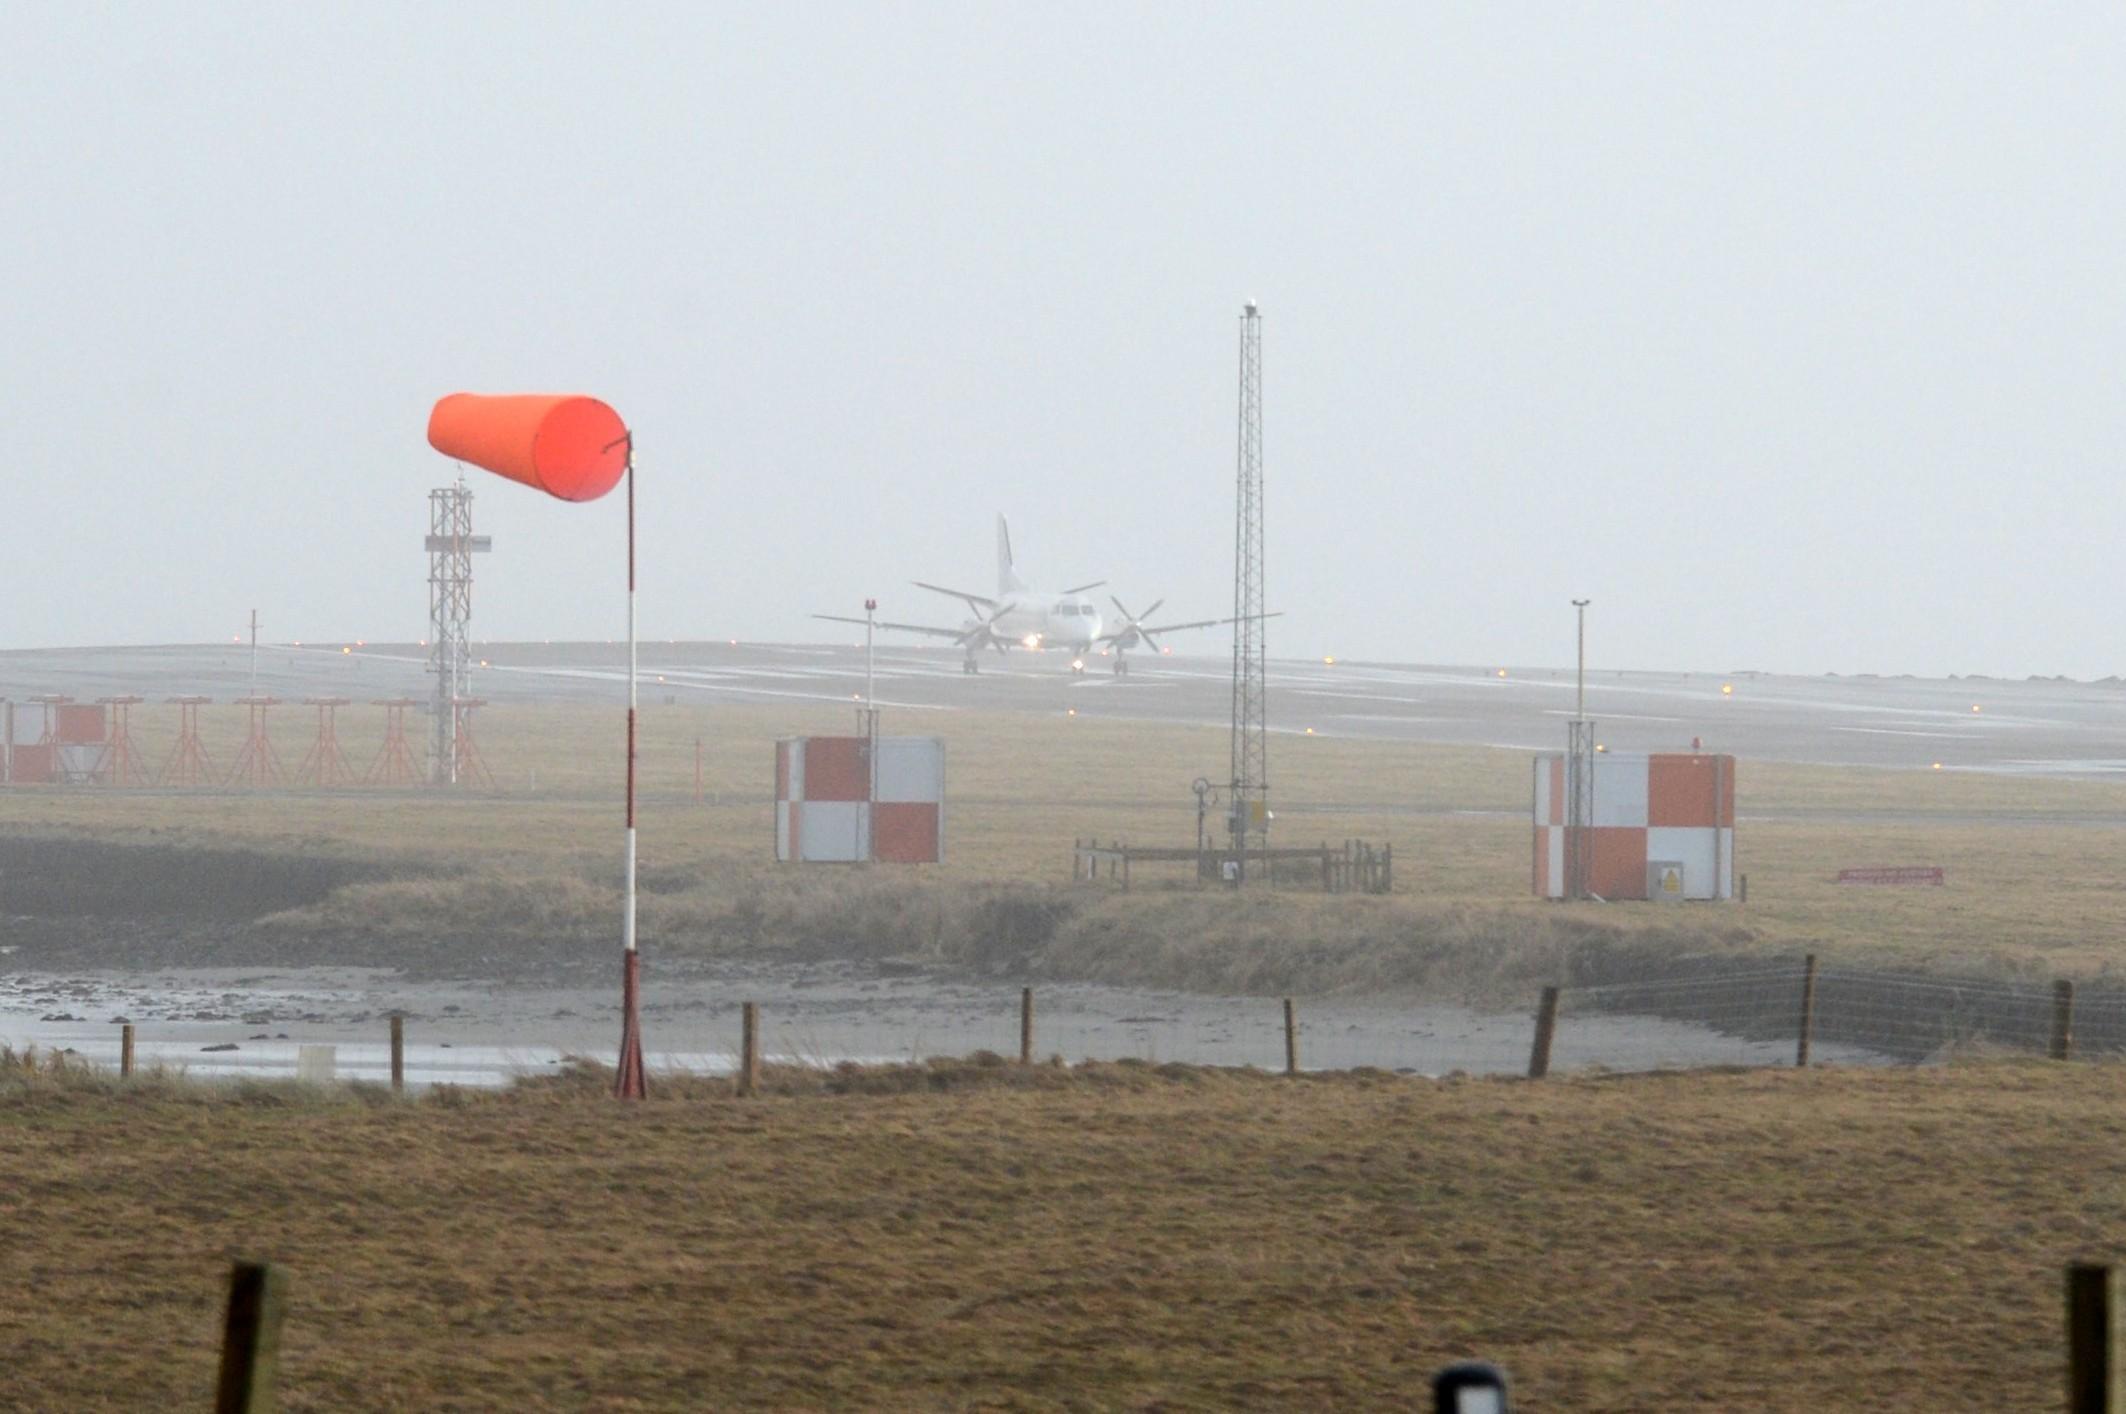 Sumburgh Airport, Shetland.